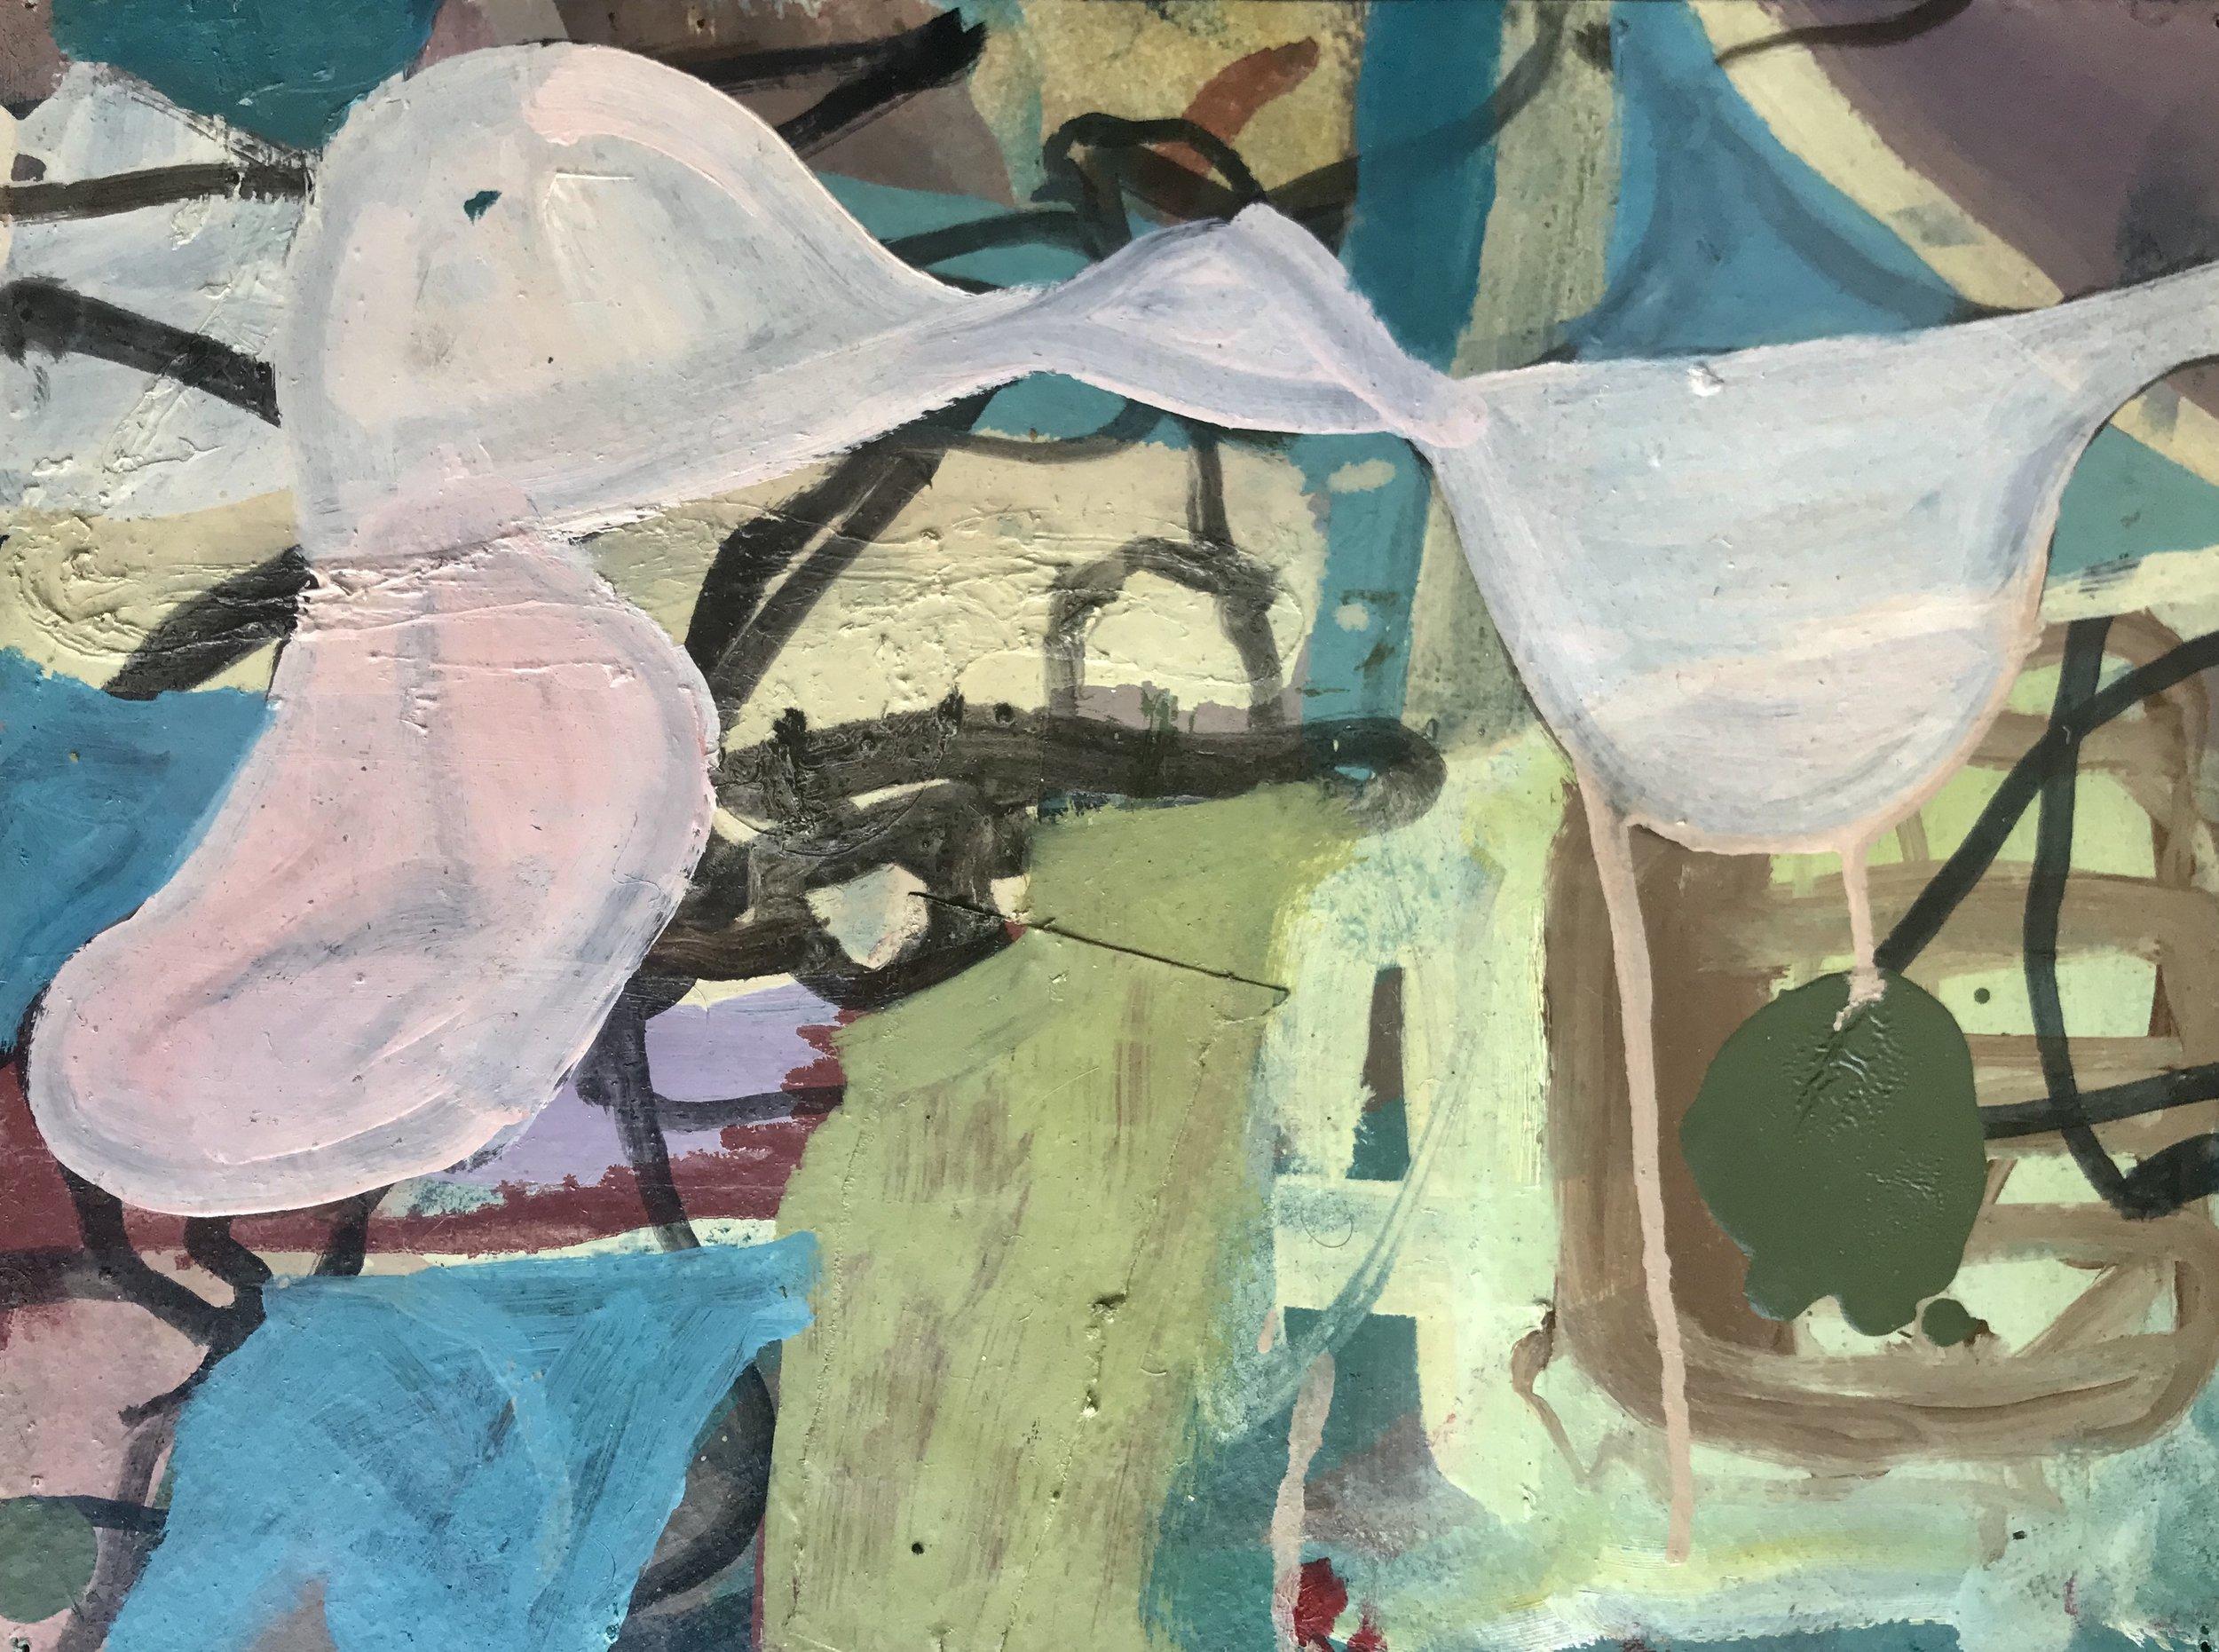 Bryan Osburn   Untitled , 2013 Oil on paper 9 x 12 inches (22.9 x 30.5 cm)